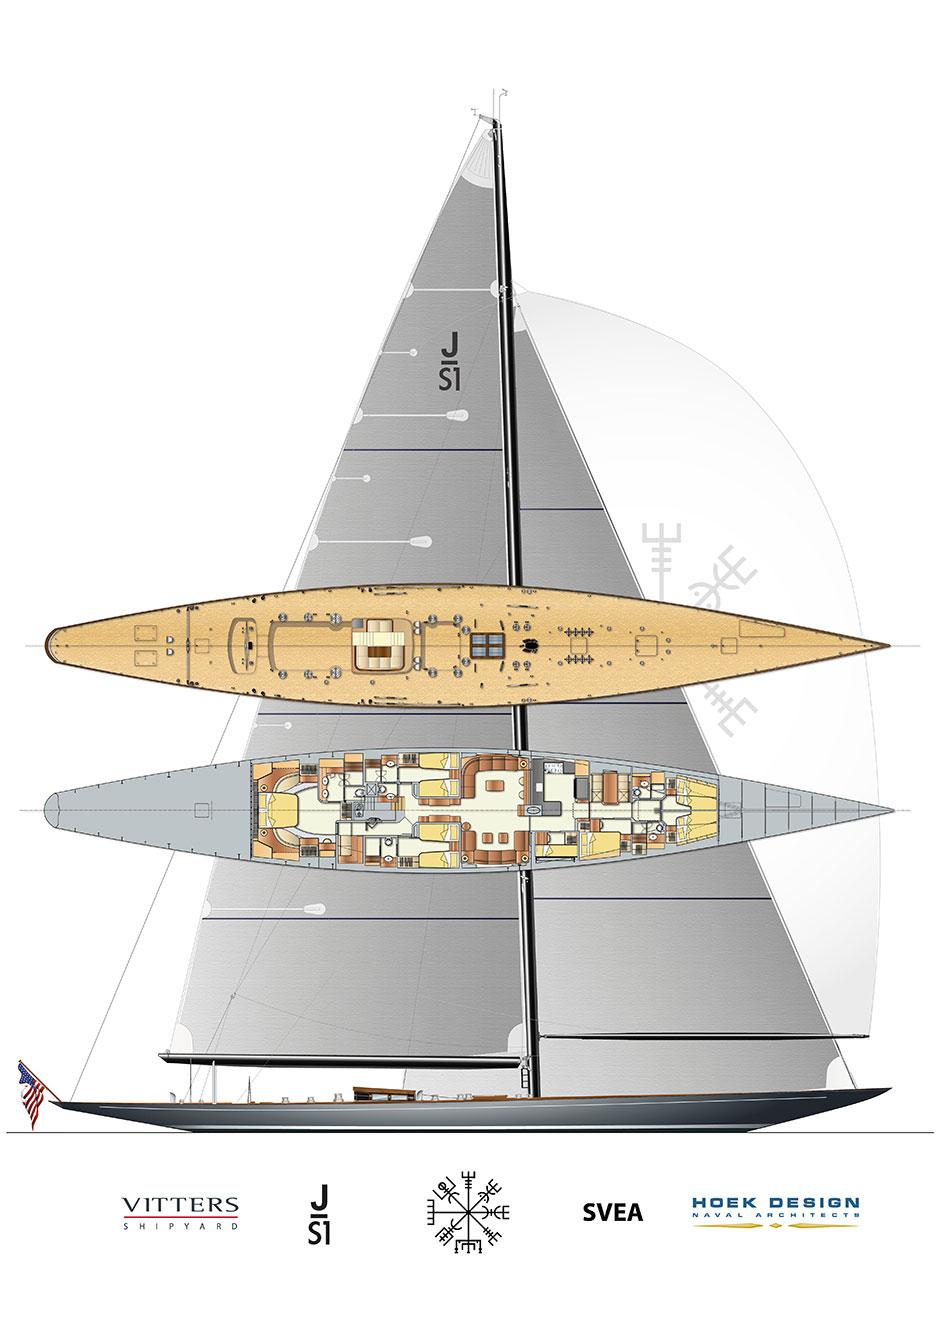 the-general-arrangement-of-the-j-class-yacht-svea